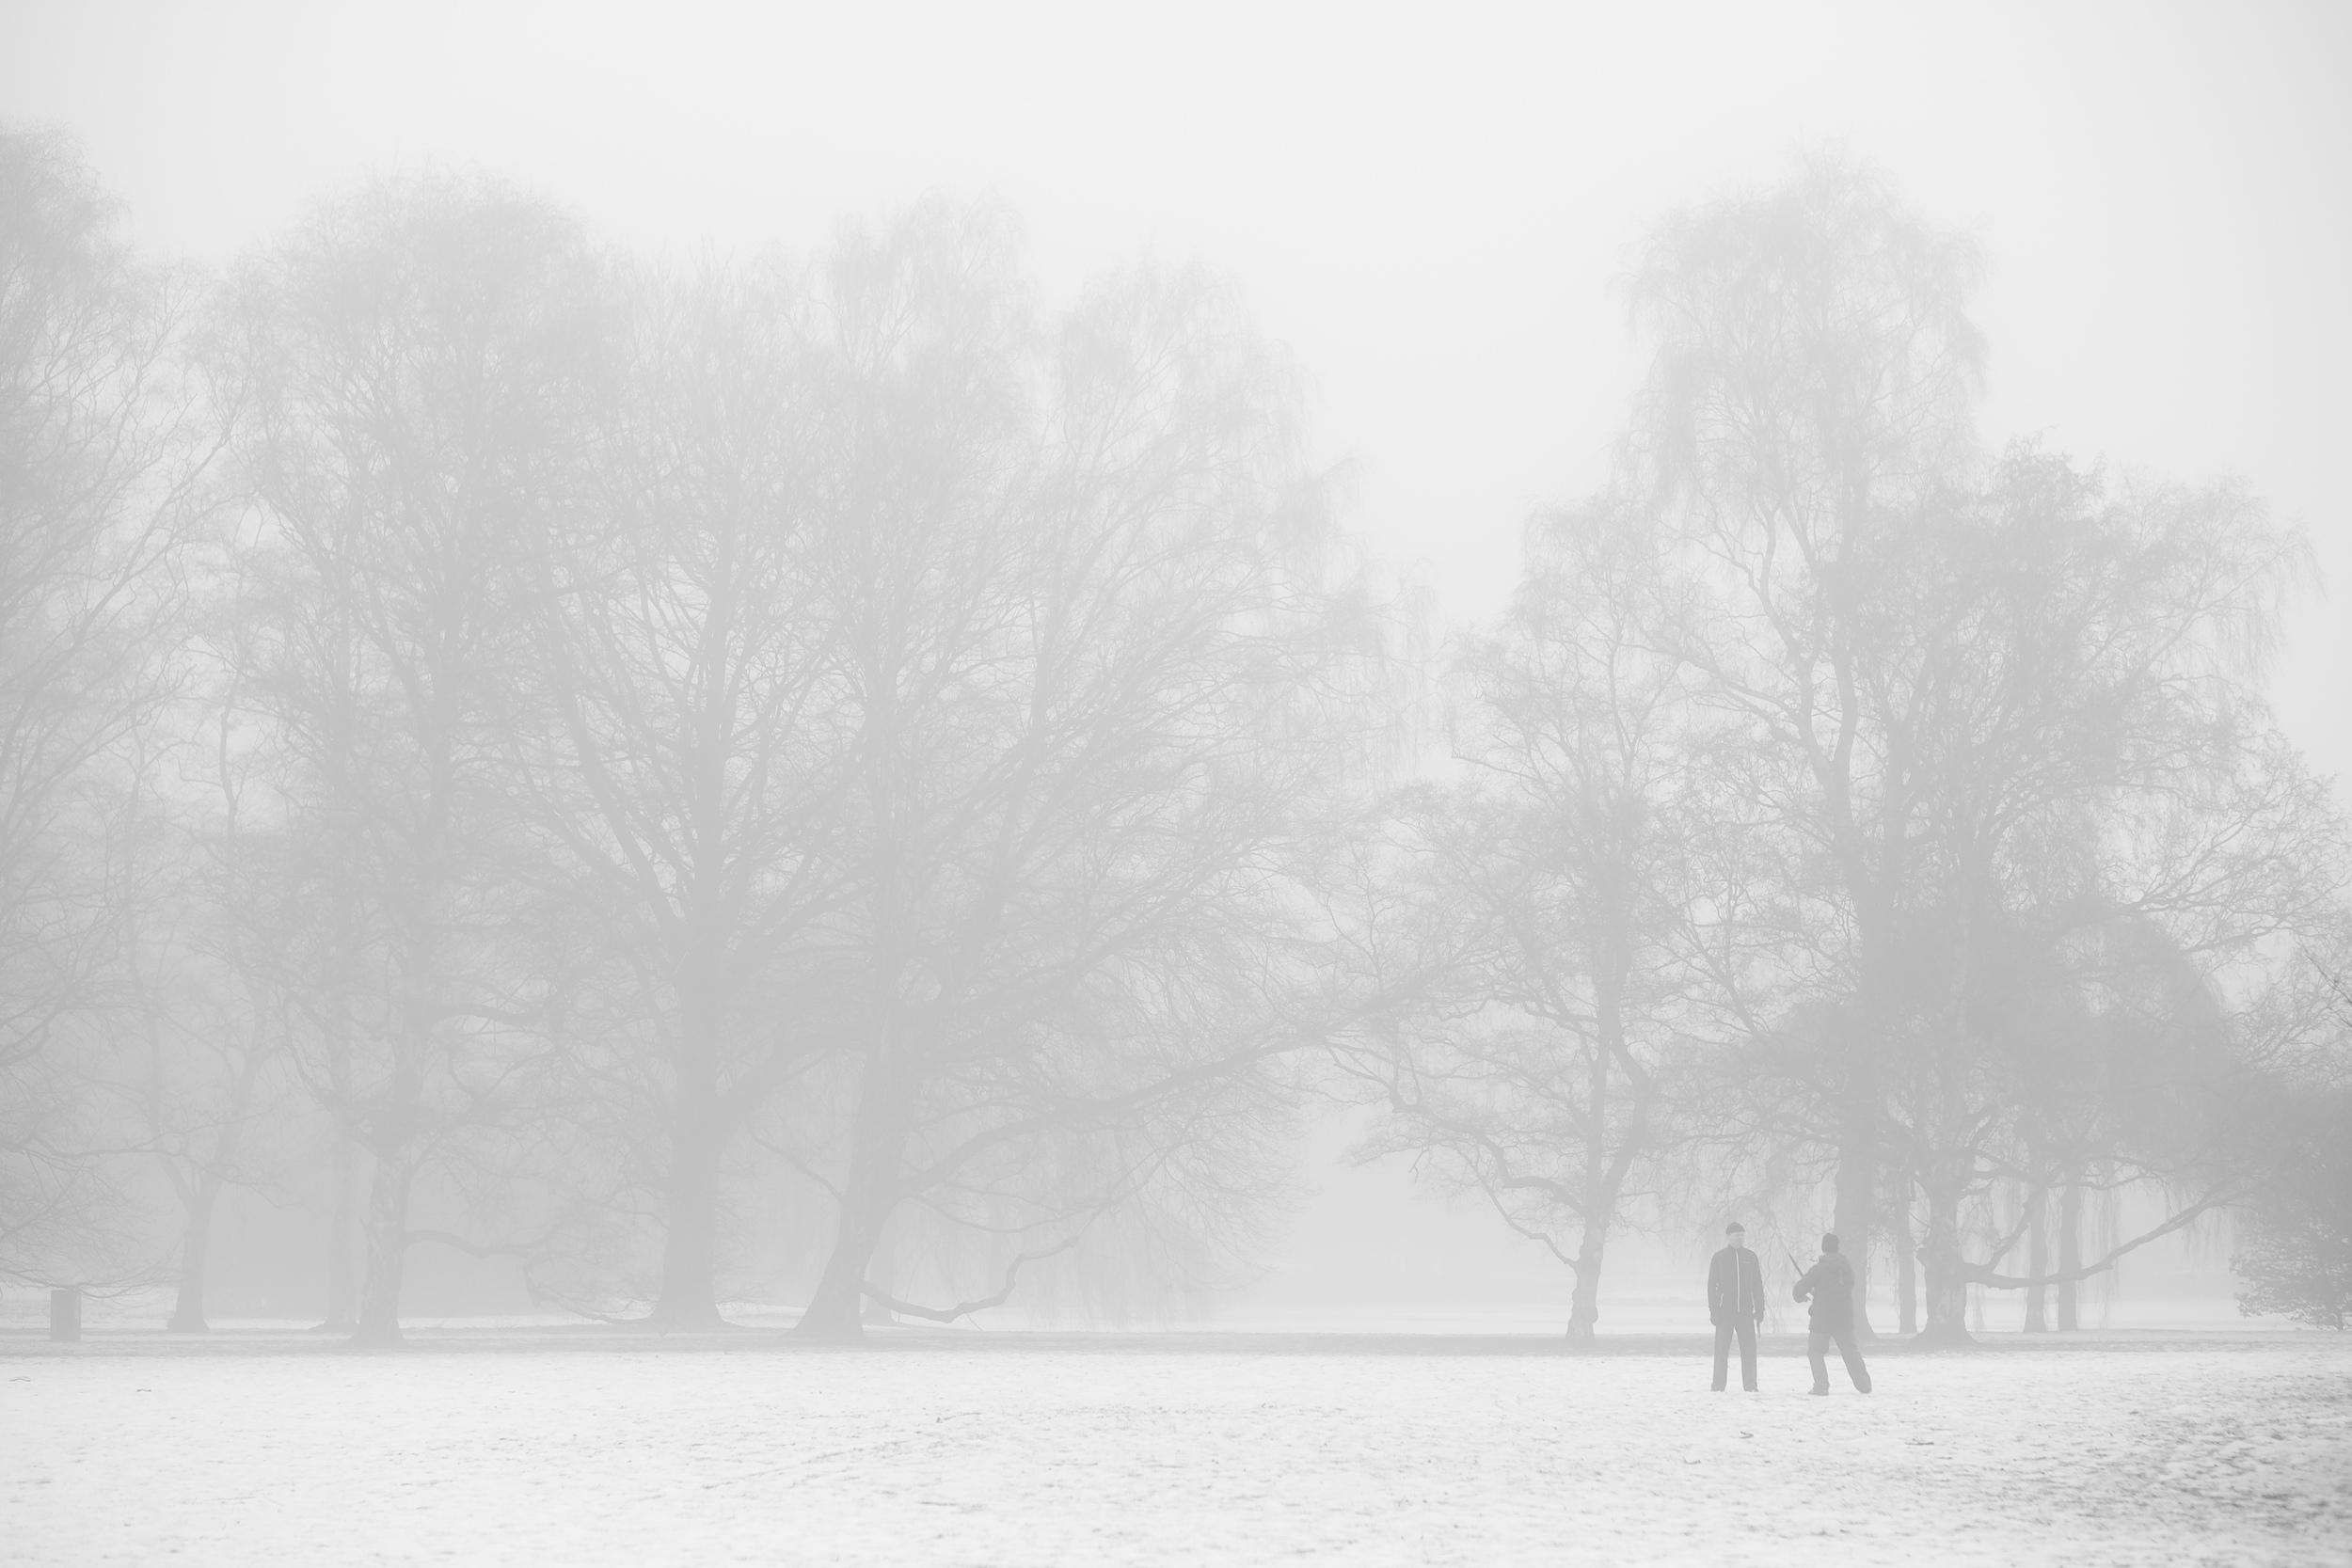 Winterfog-7160.jpg